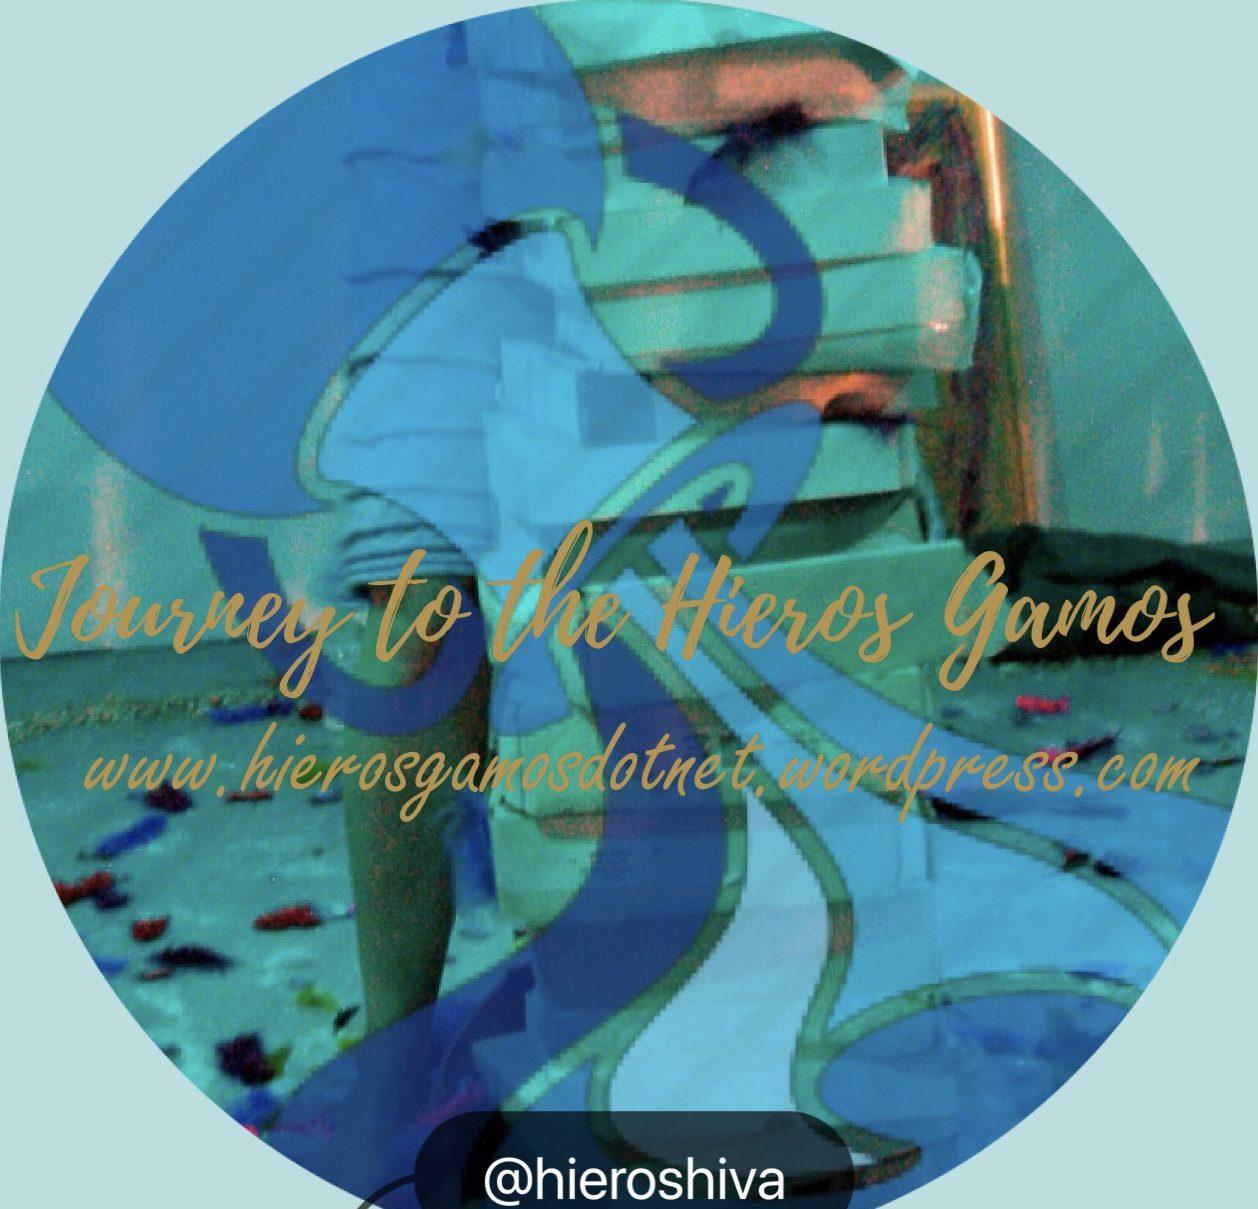 JOURNEY TO THE HIEROS GAMOS